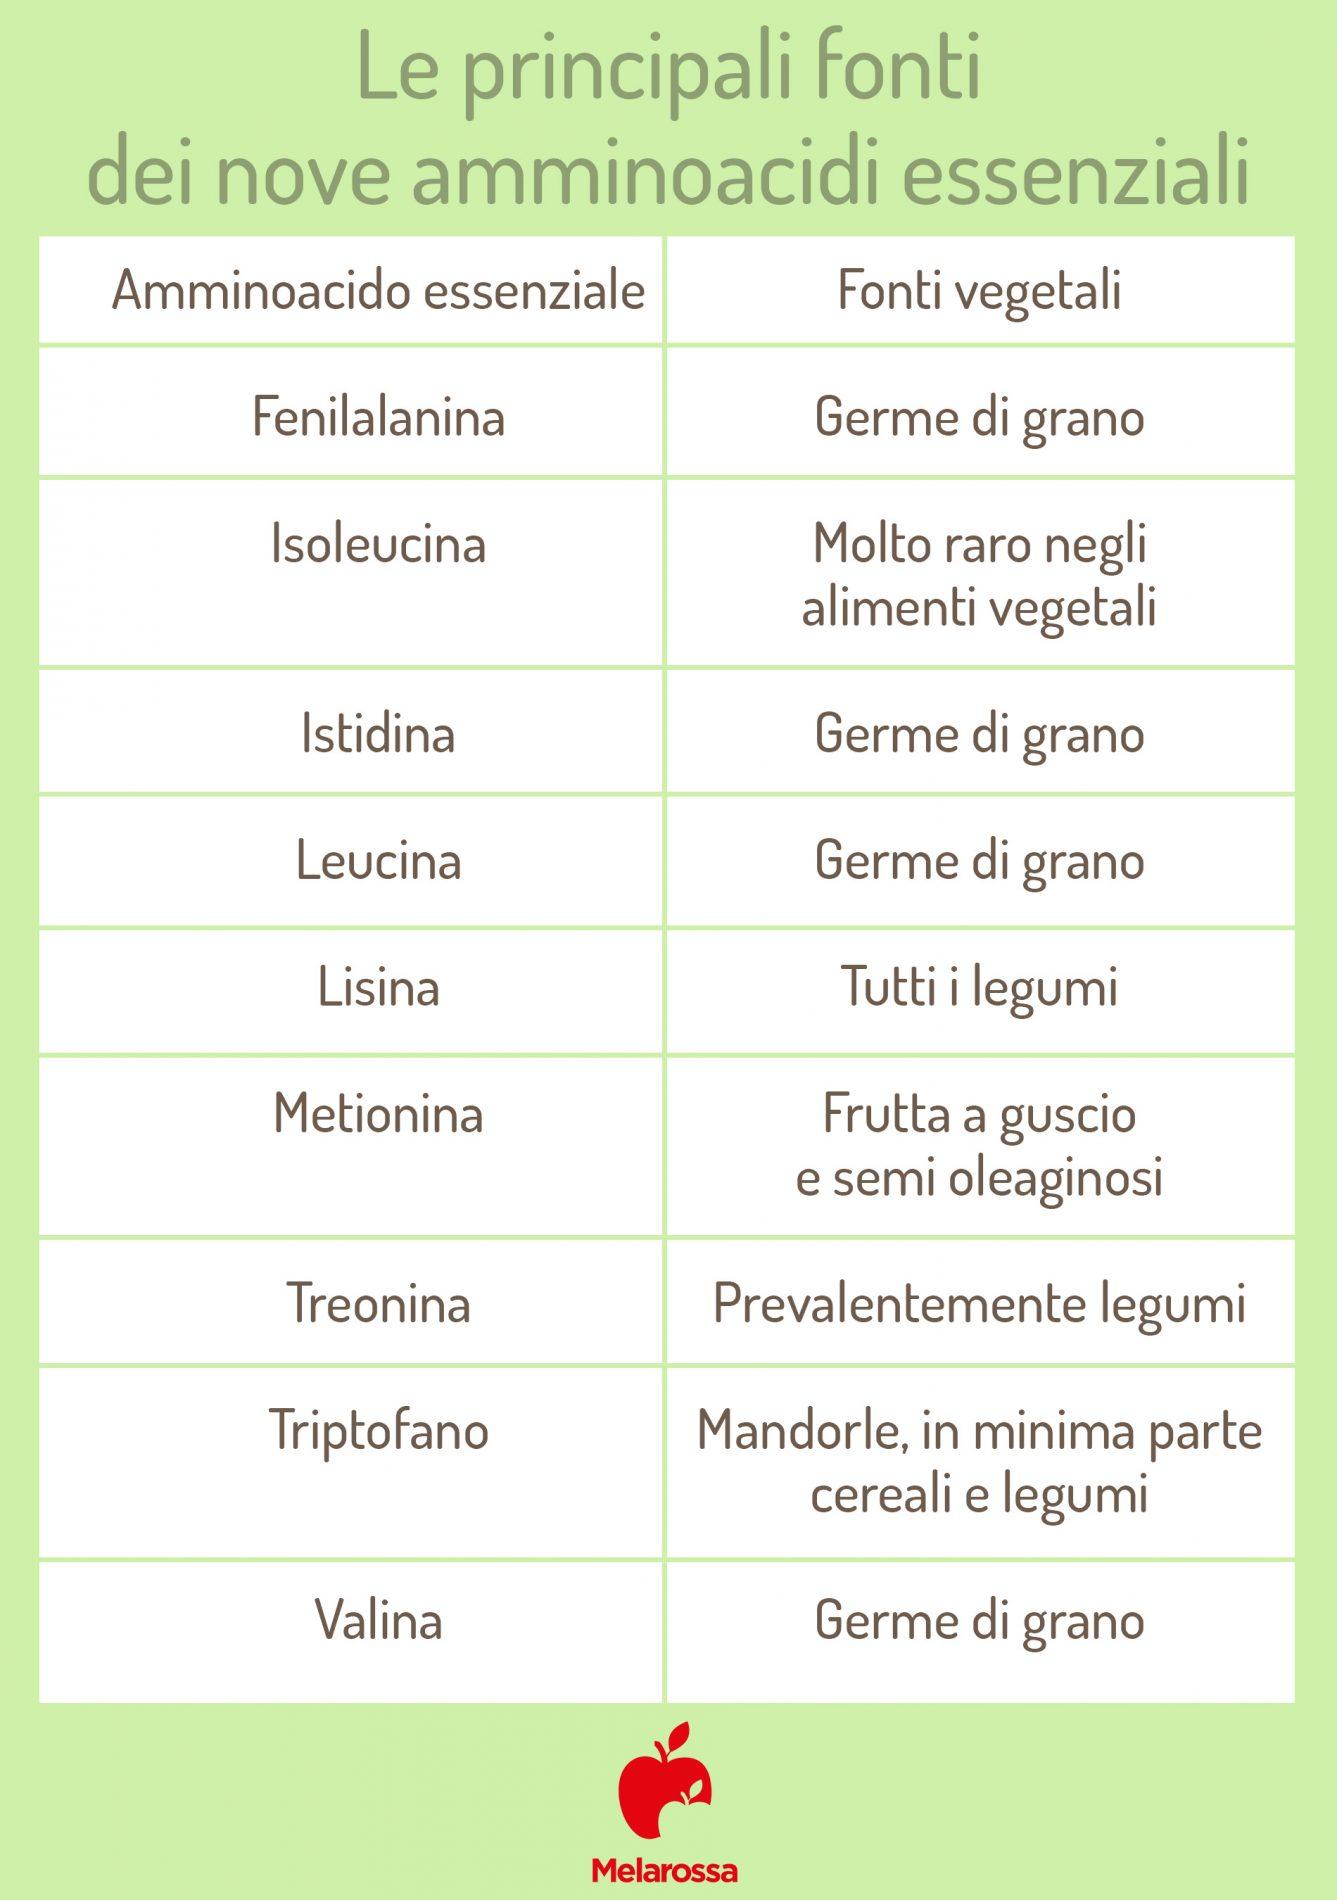 proteine vegetali e amminoacidi